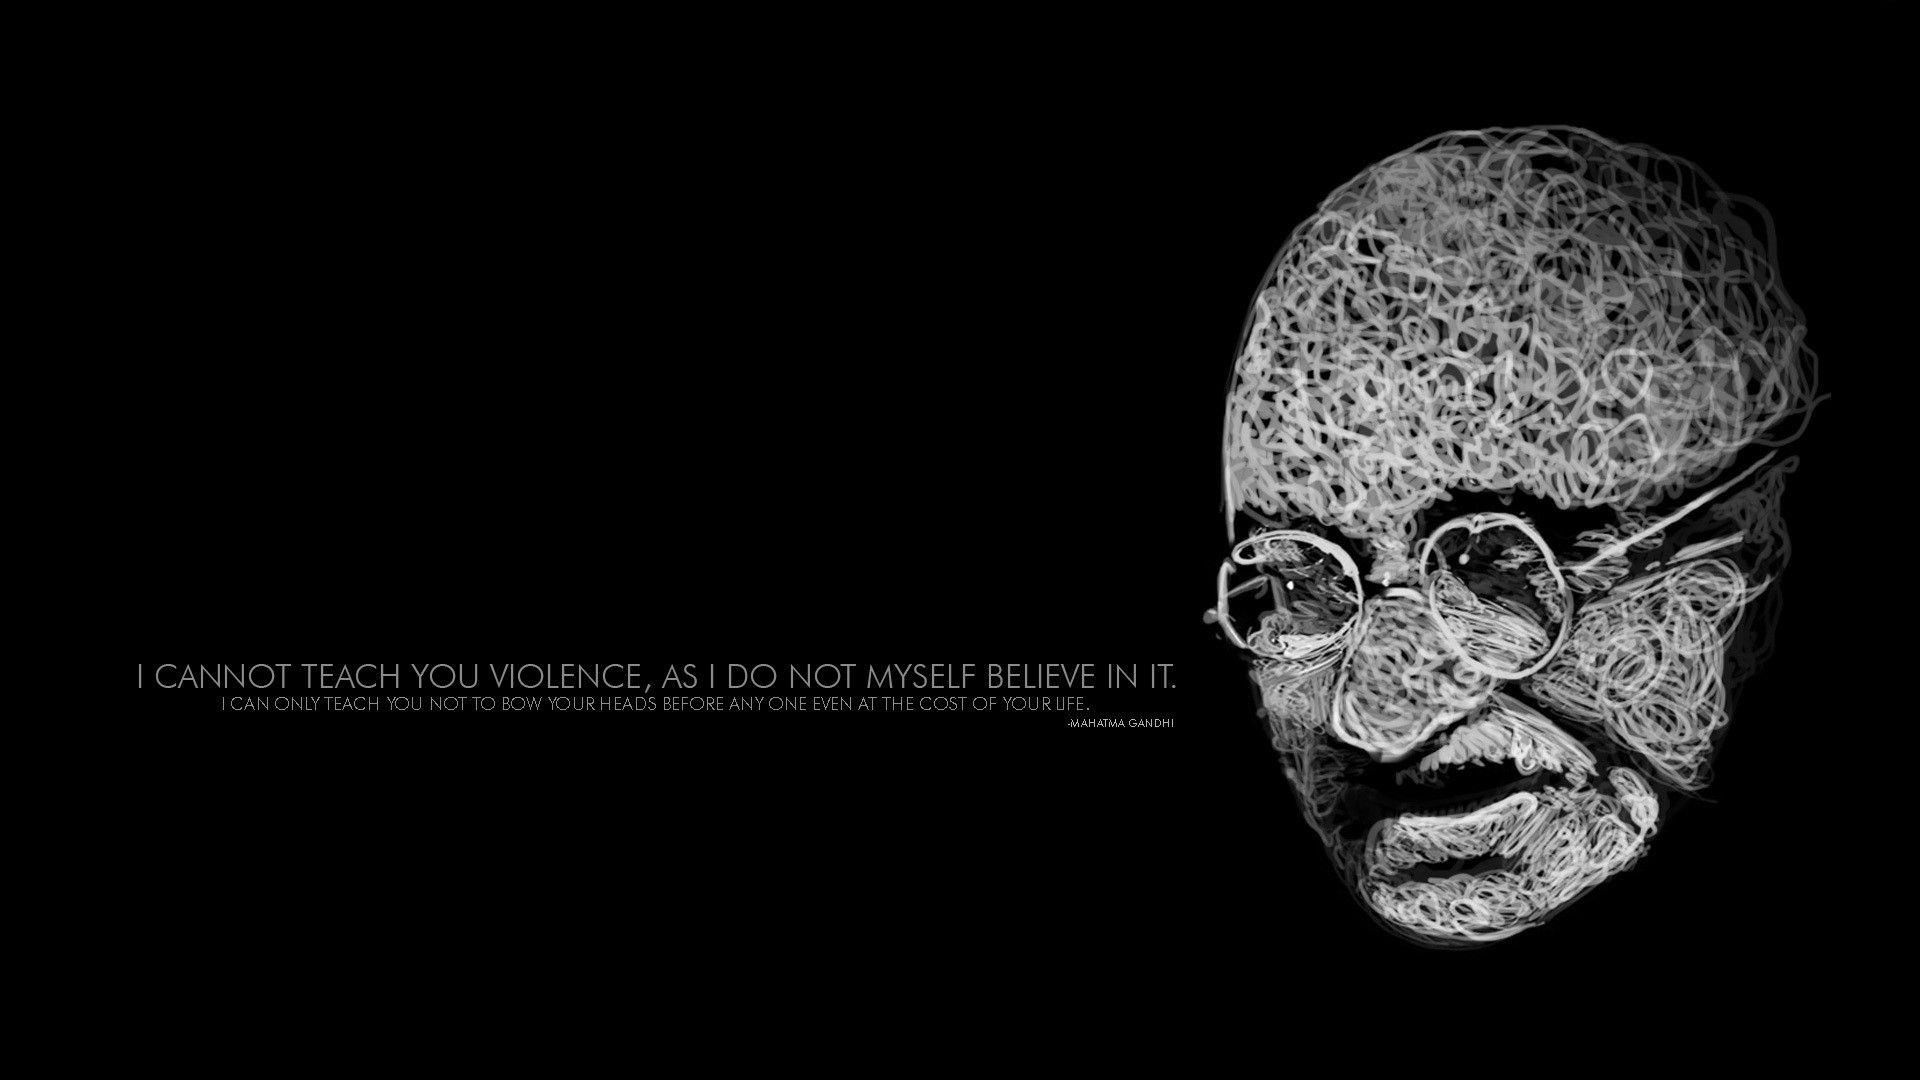 Mahatma Gandhi Wallpapers Wallpaper Cave In 2020 Wallpaper Quotes Mahatma Gandhi Quotes Gandhi Quotes